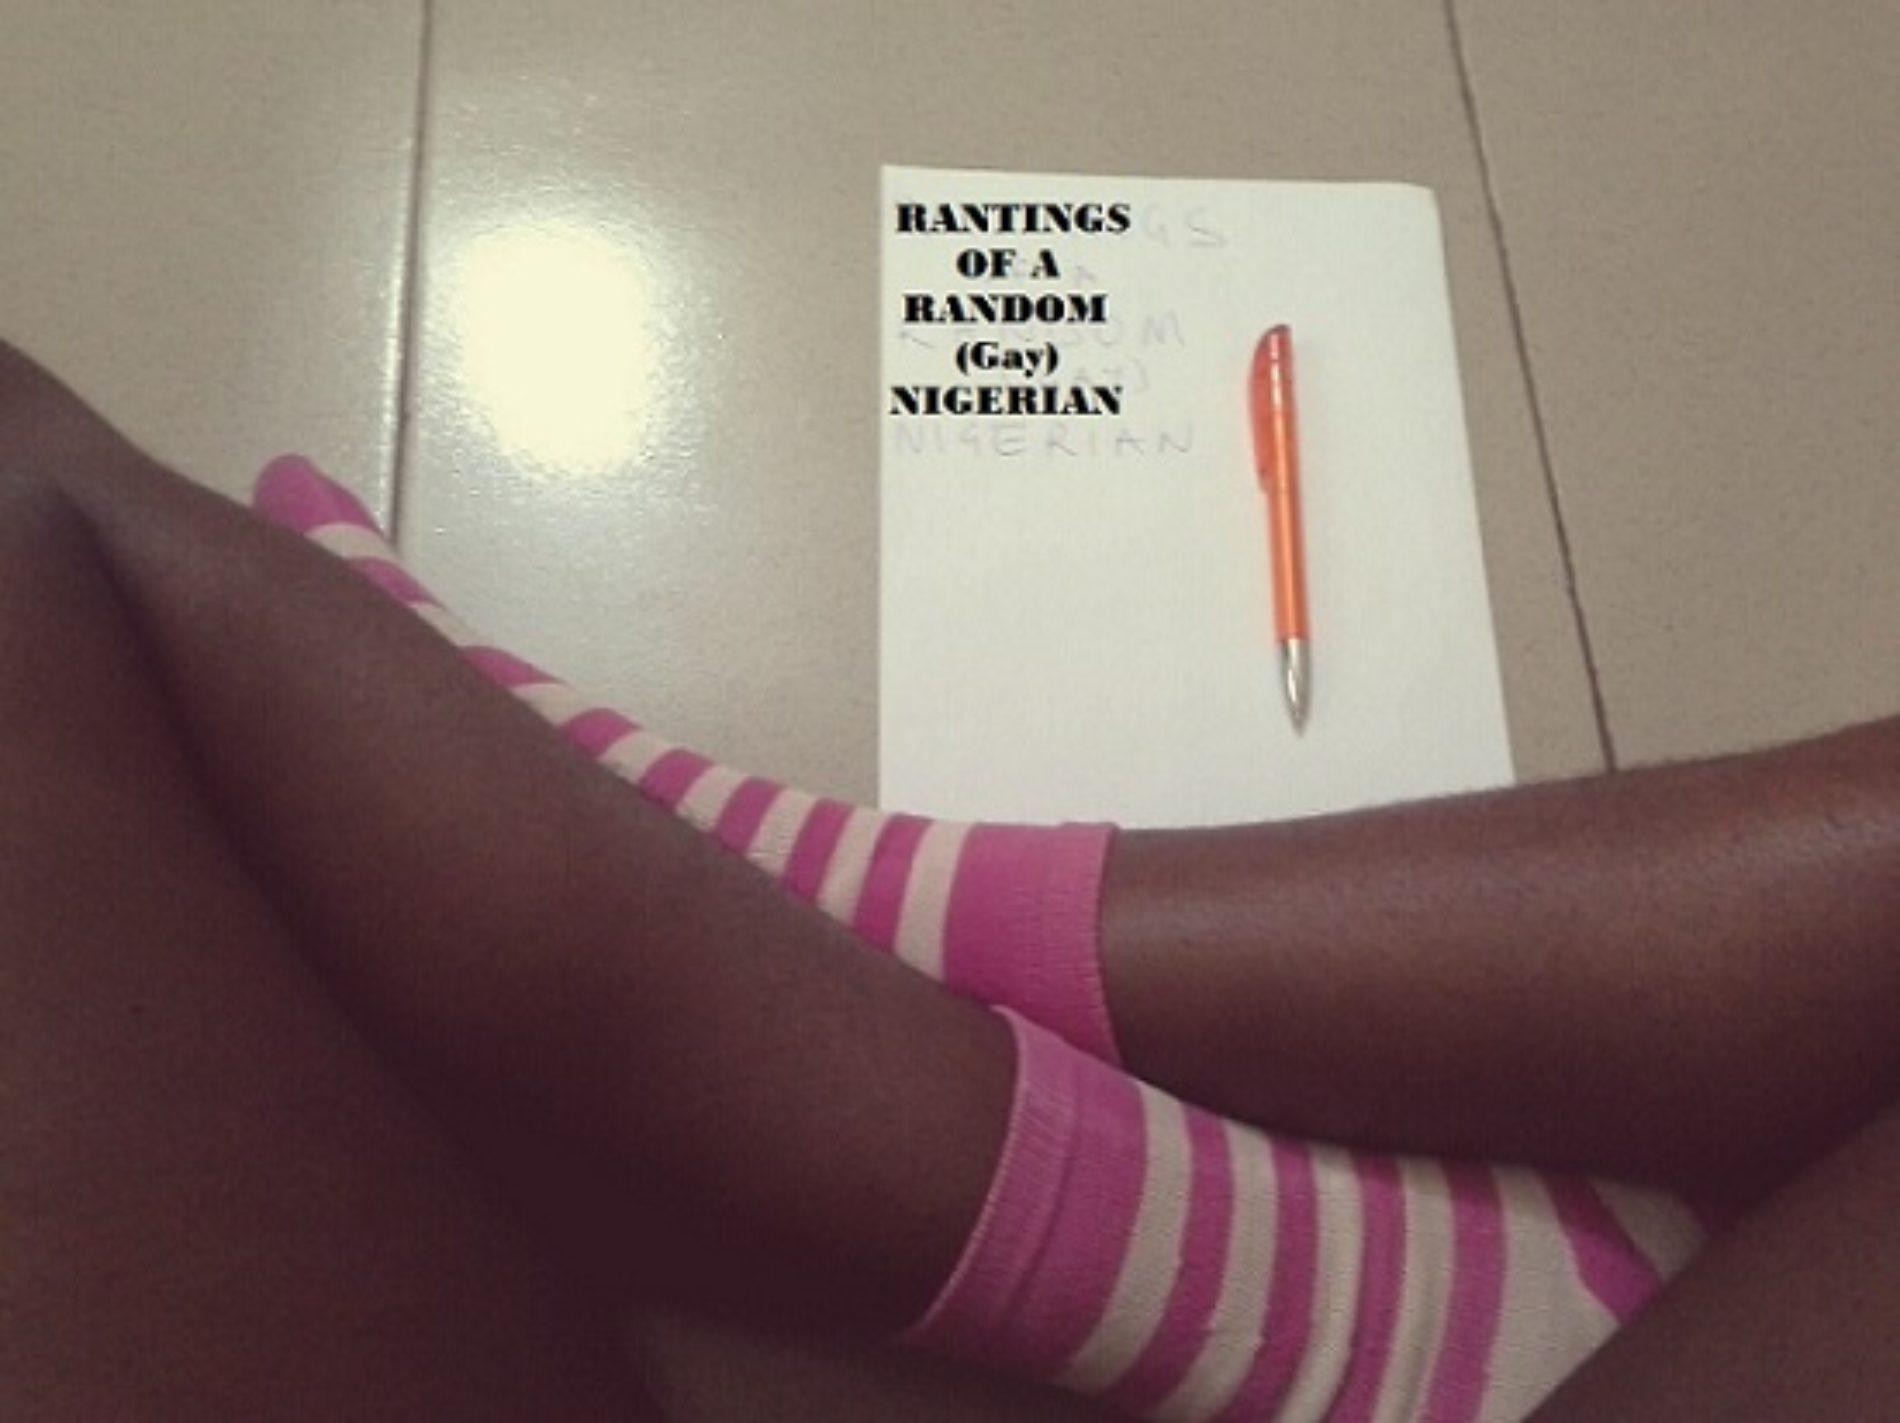 RANTINGS OF A RANDOM (Gay) NIGERIAN (Entry 11)